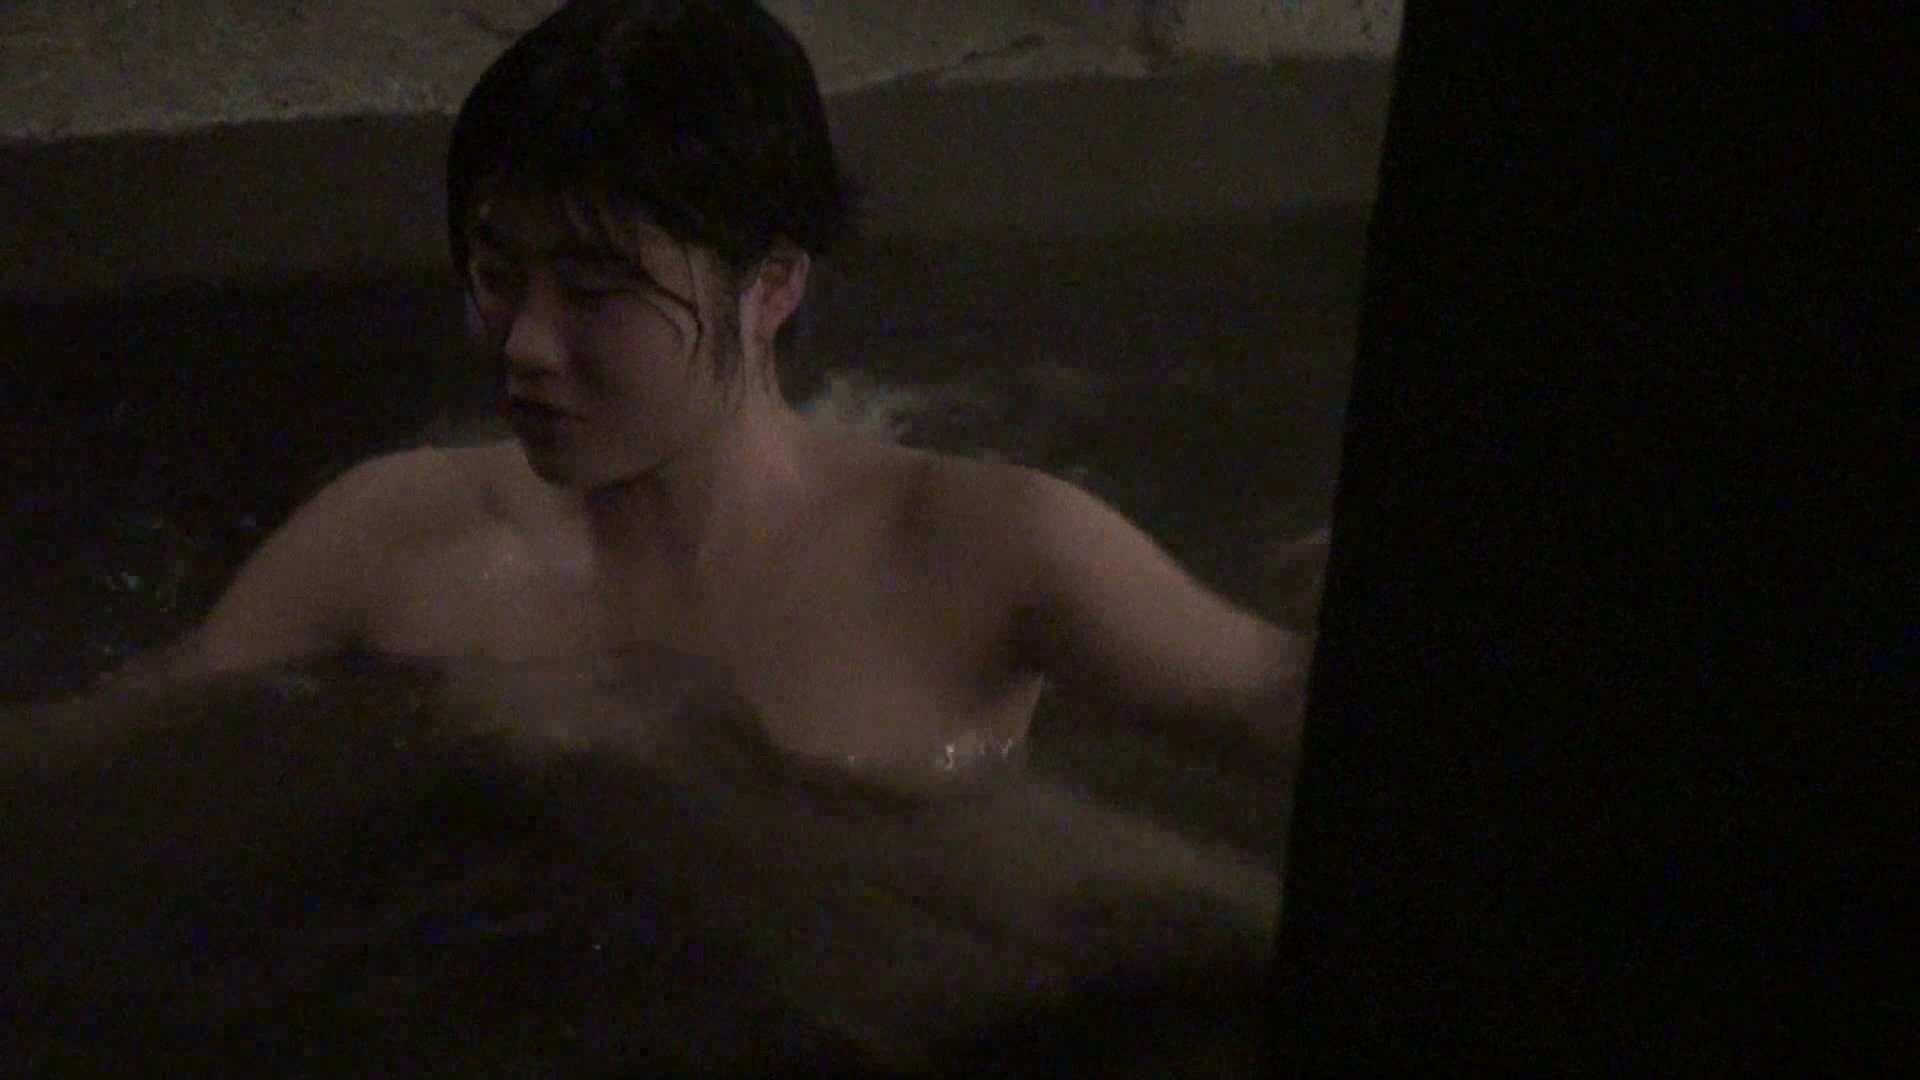 Aquaな露天風呂Vol.343 女体盗撮 盗撮ヌード画像 91連発 65